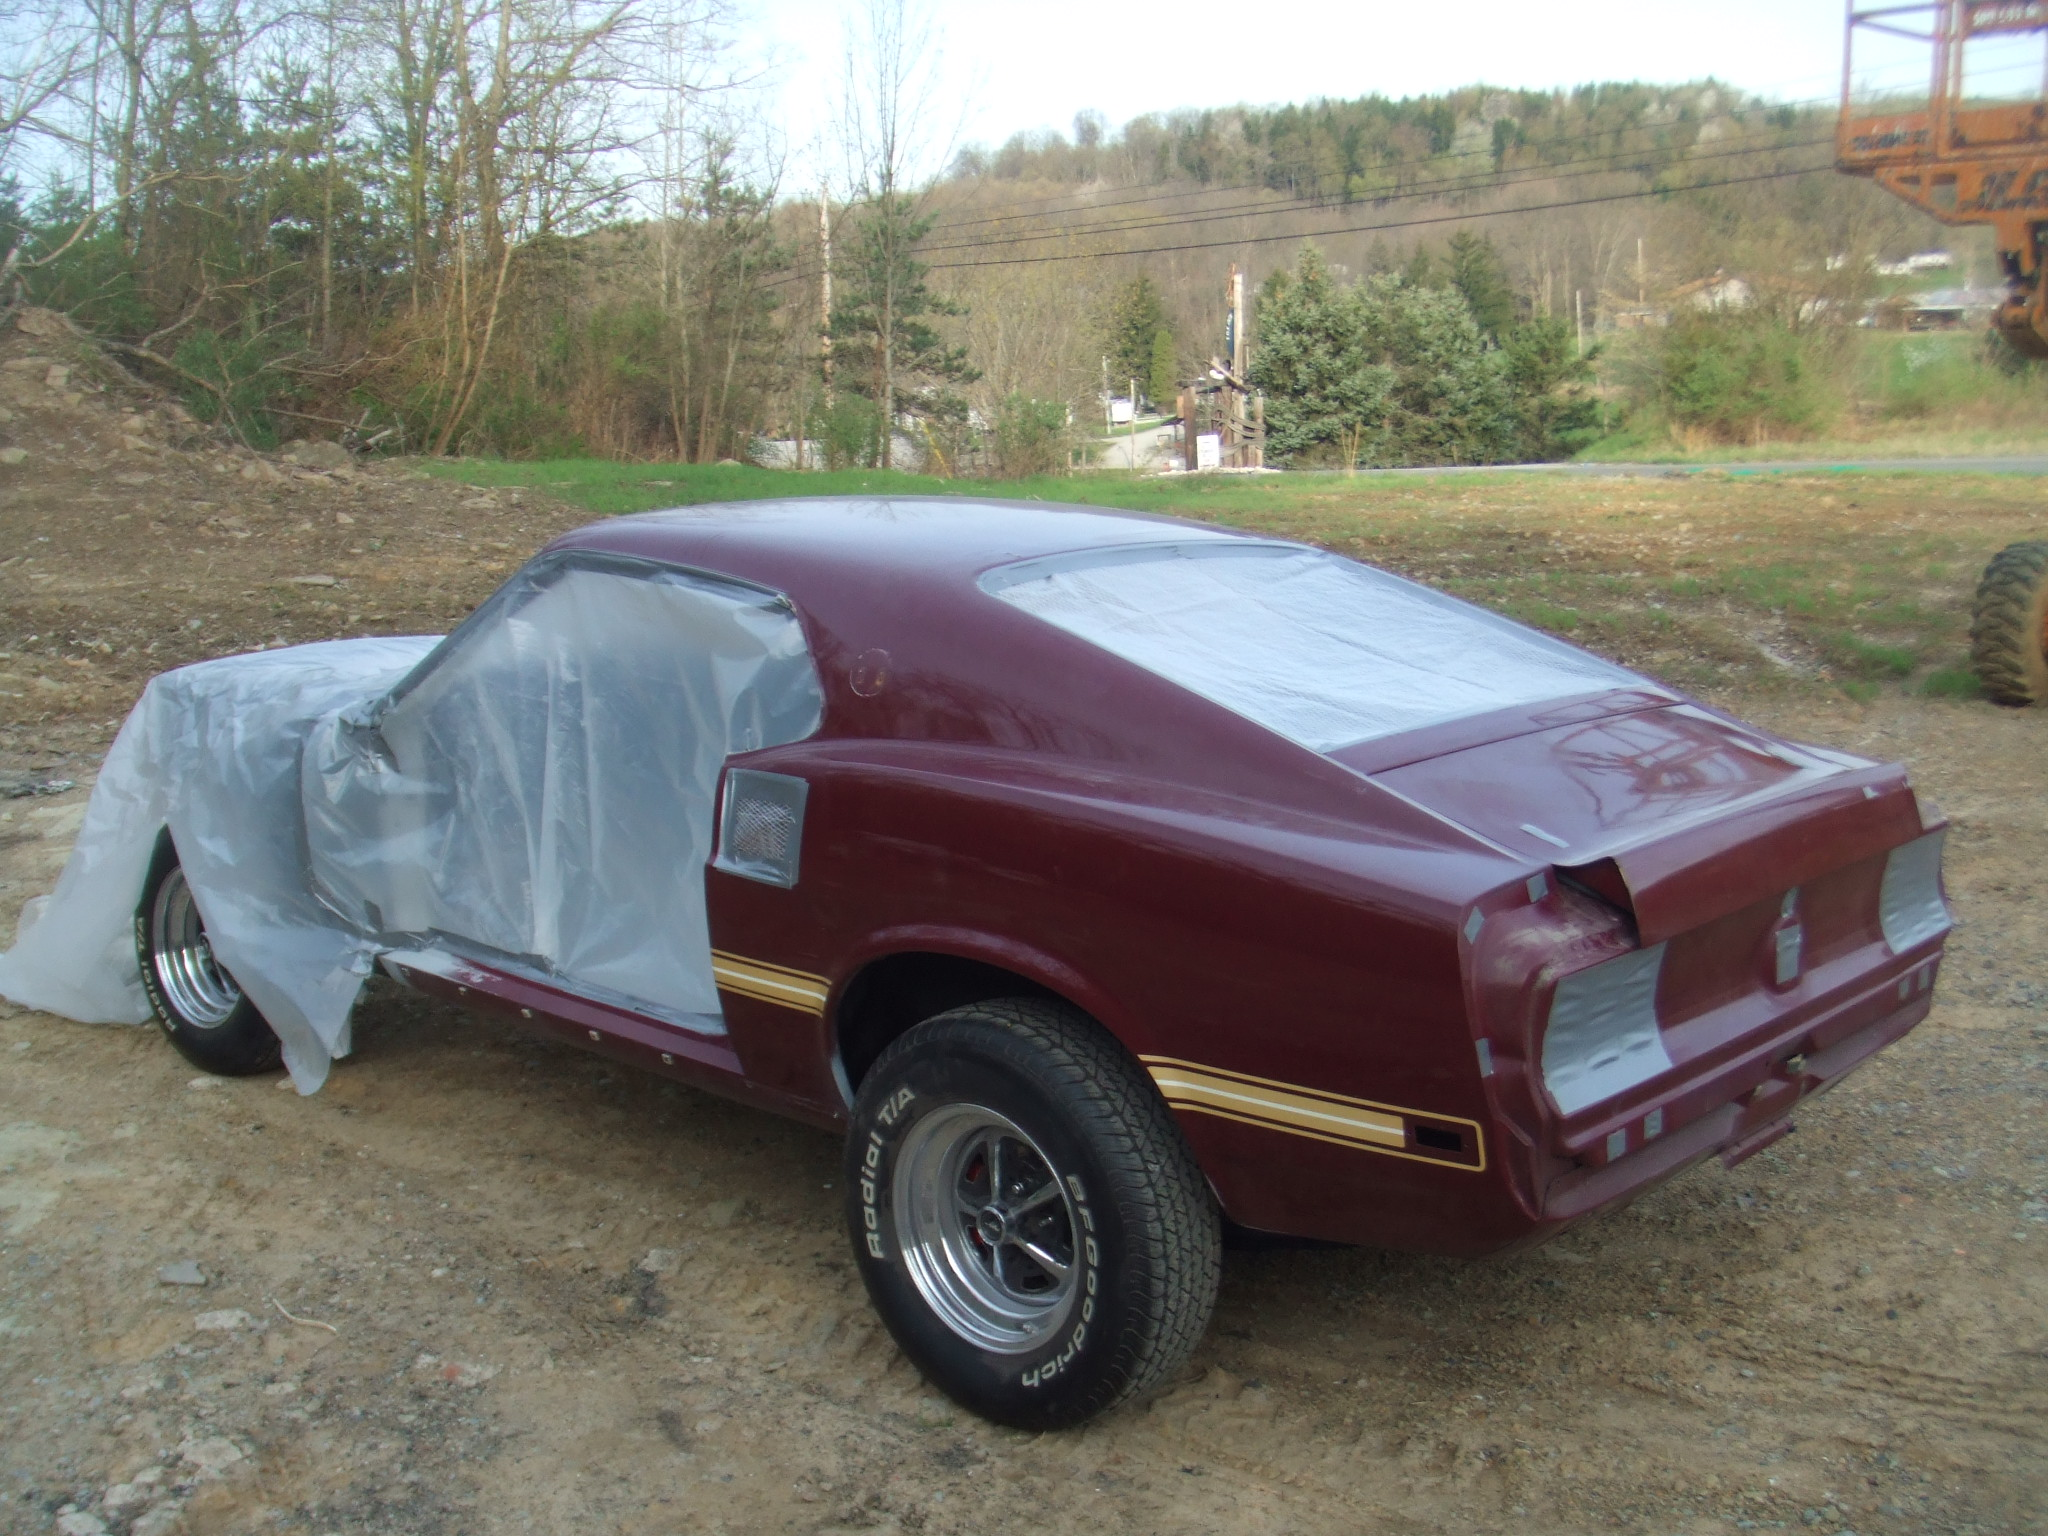 69 Mustang Mach 1 B